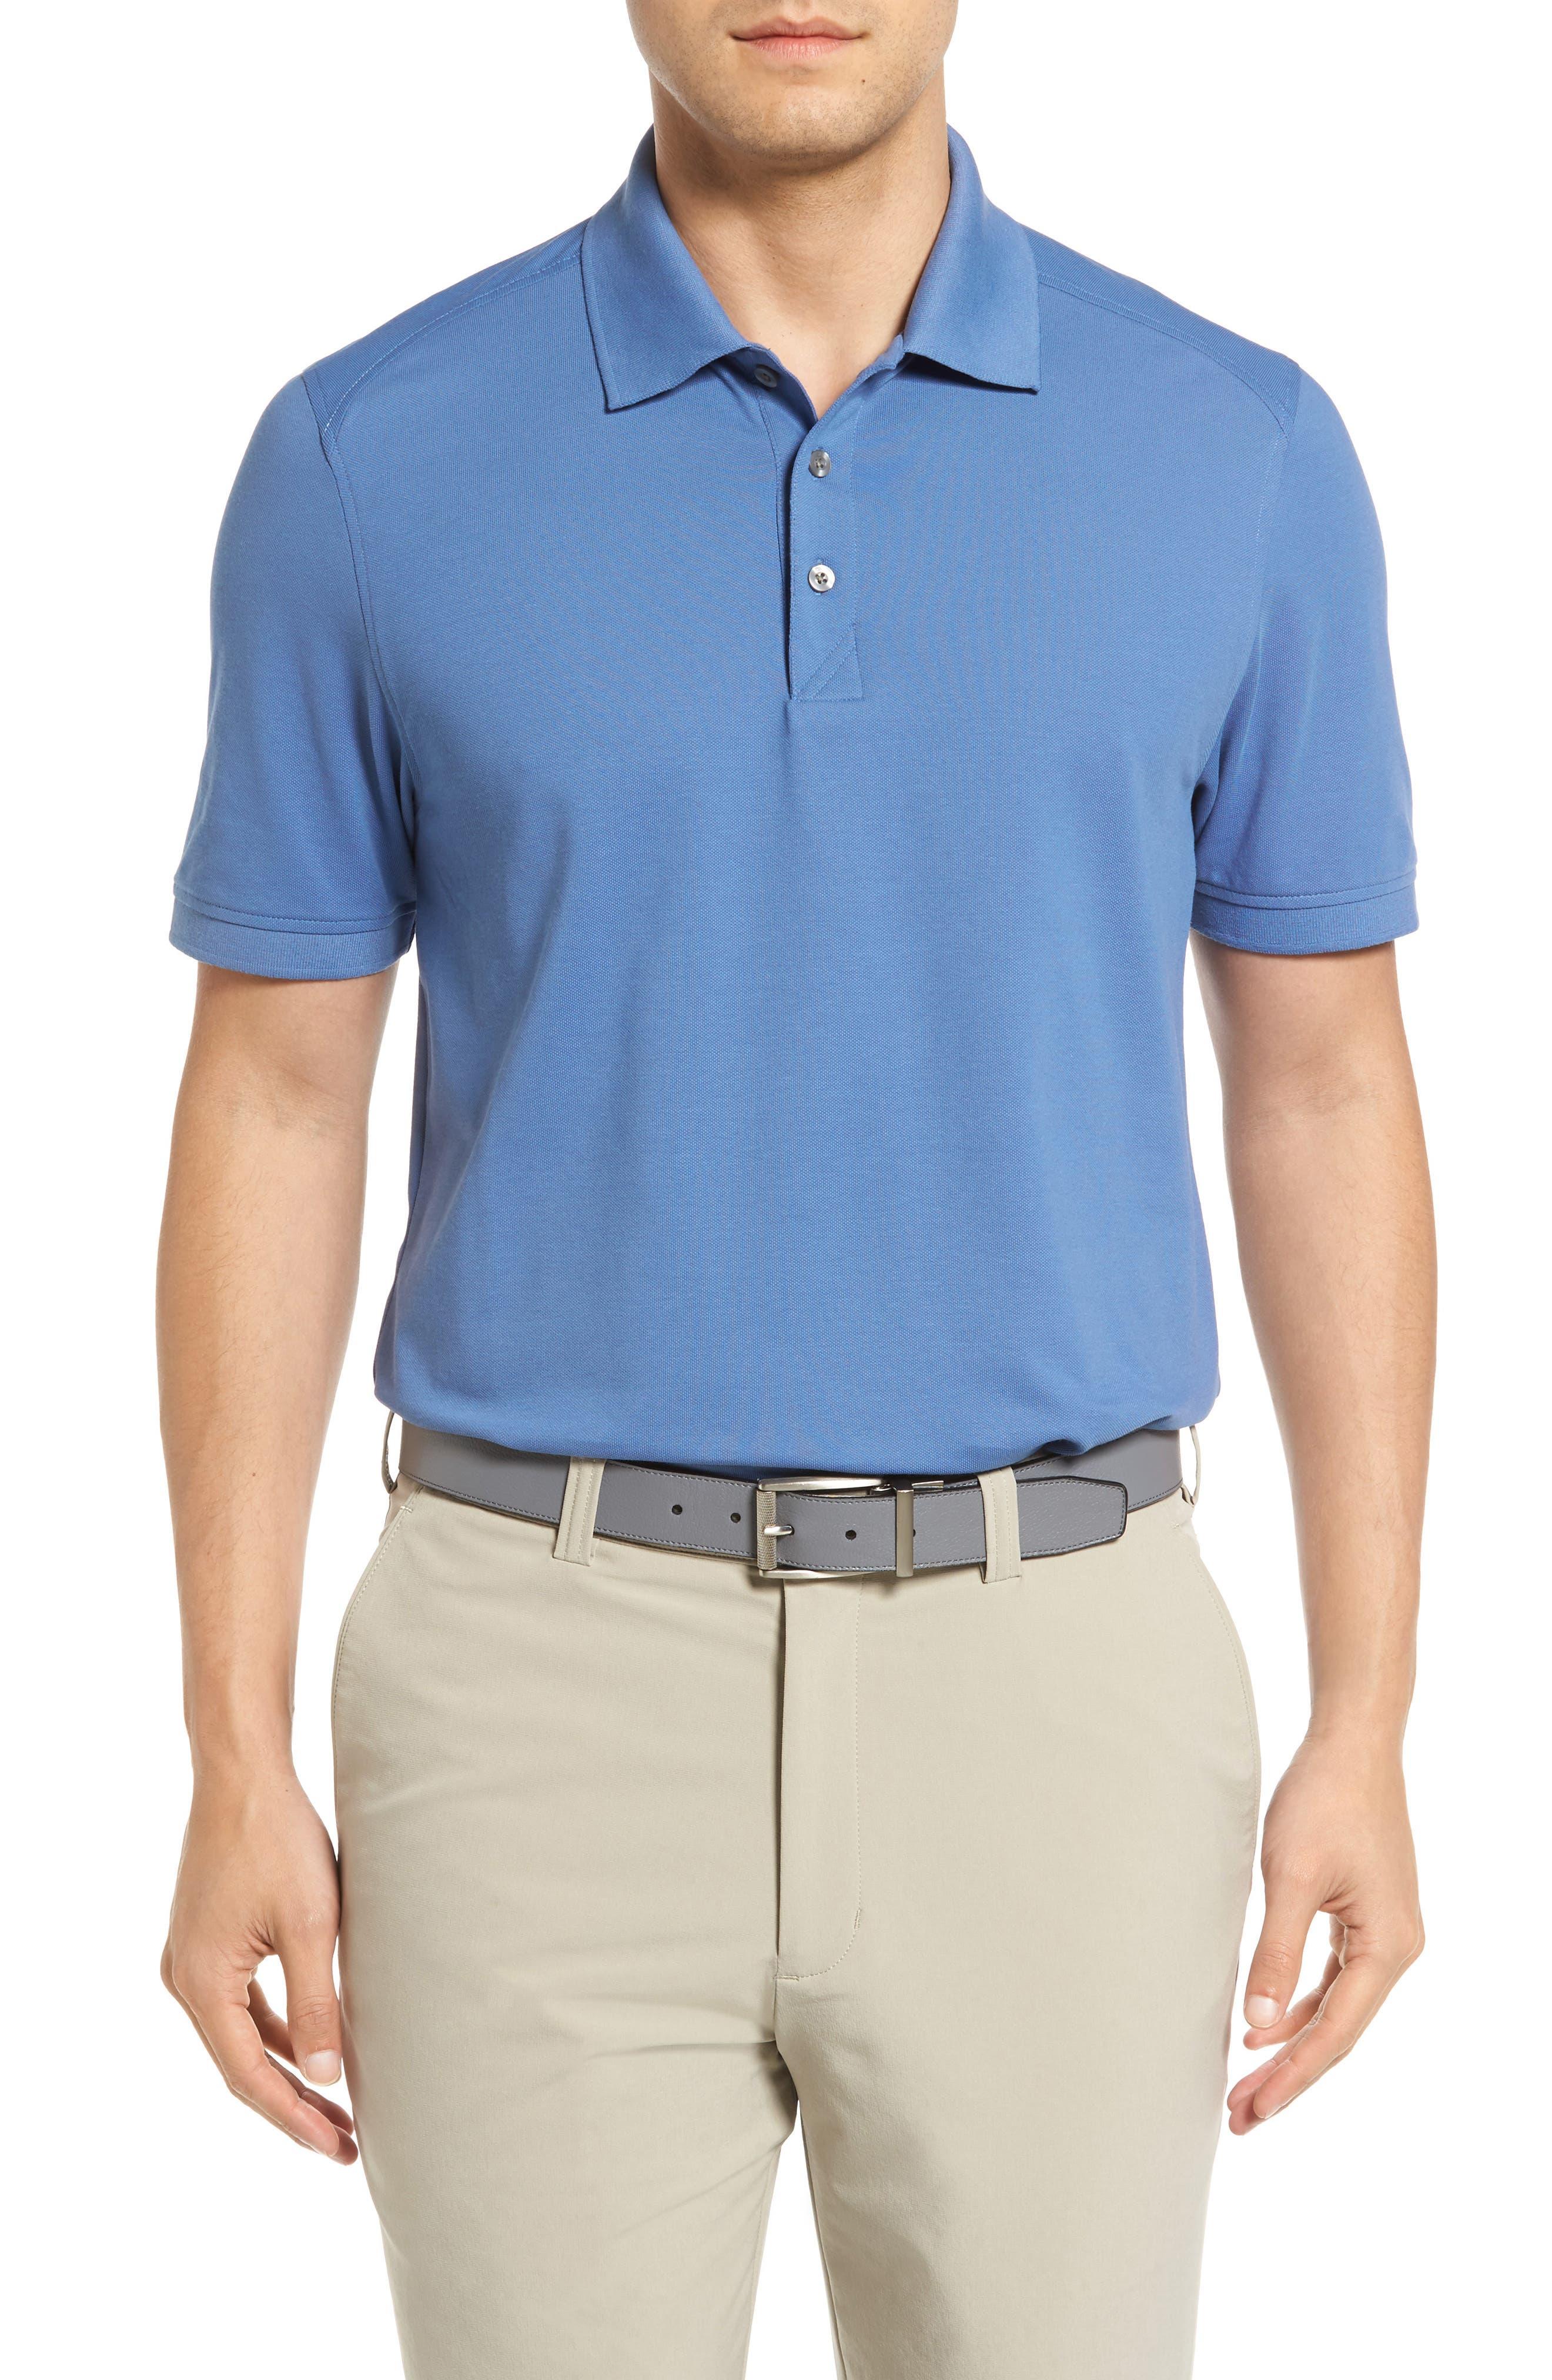 Advantage Golf Polo,                         Main,                         color, Sea Blue